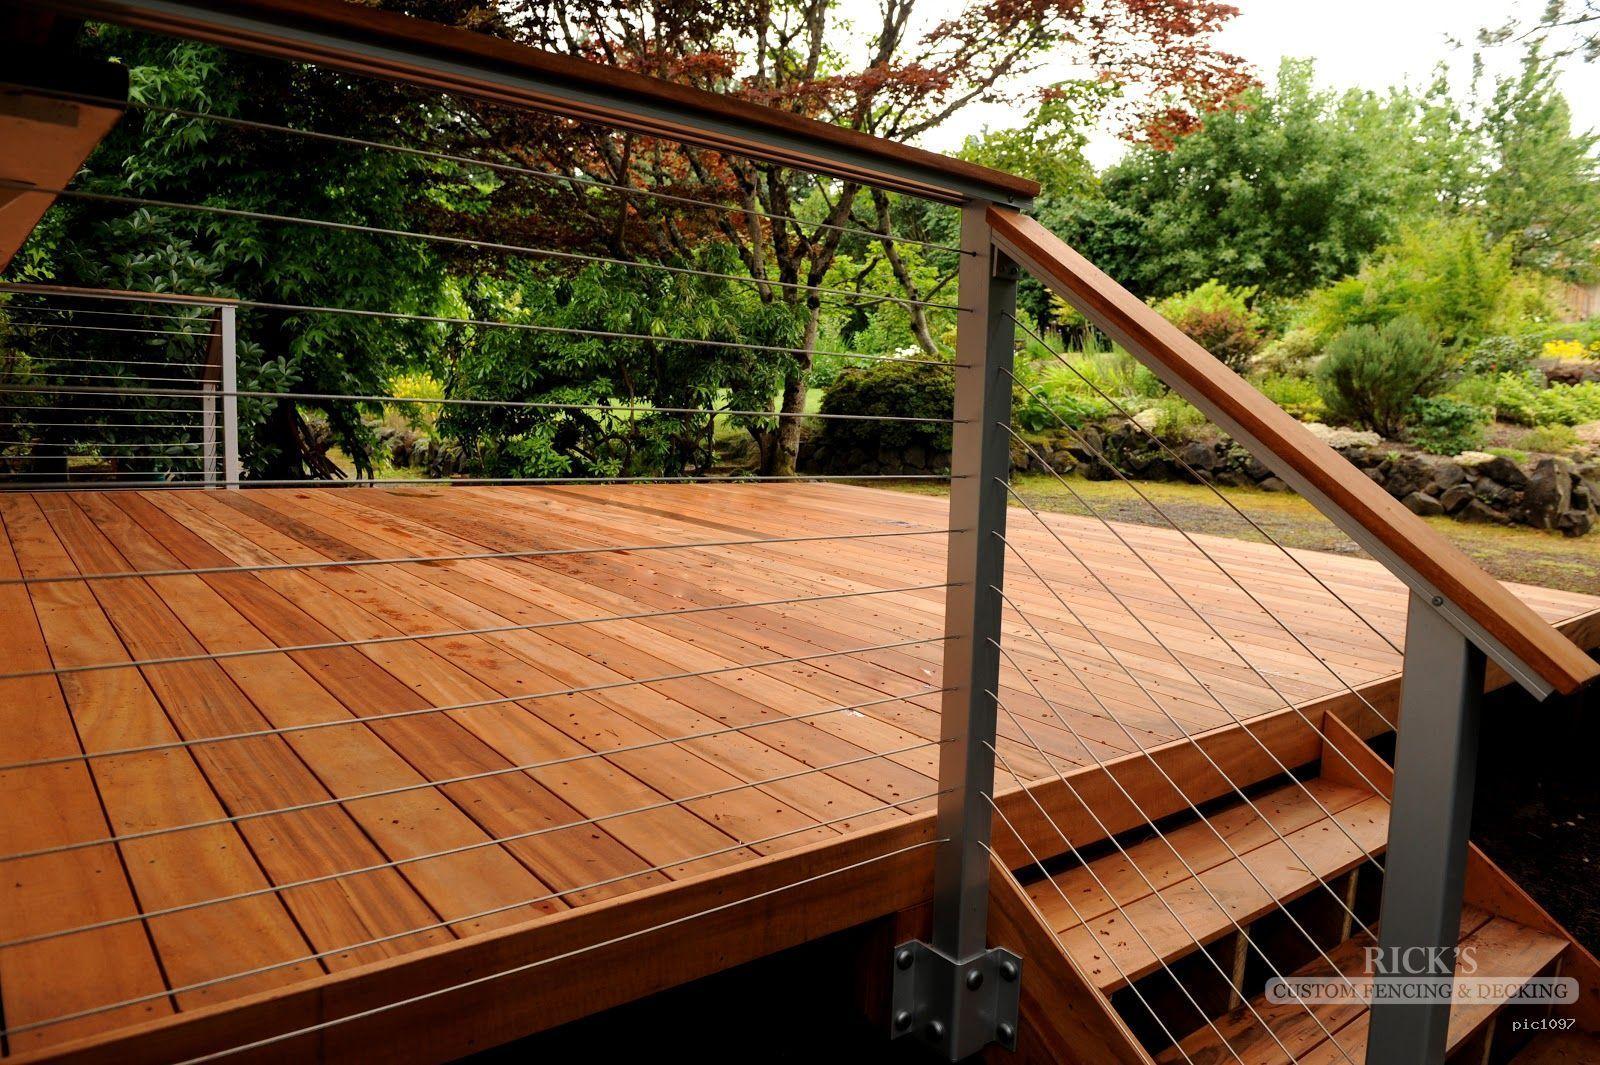 N/a Luxury vinyl plank, Luxury vinyl plank flooring